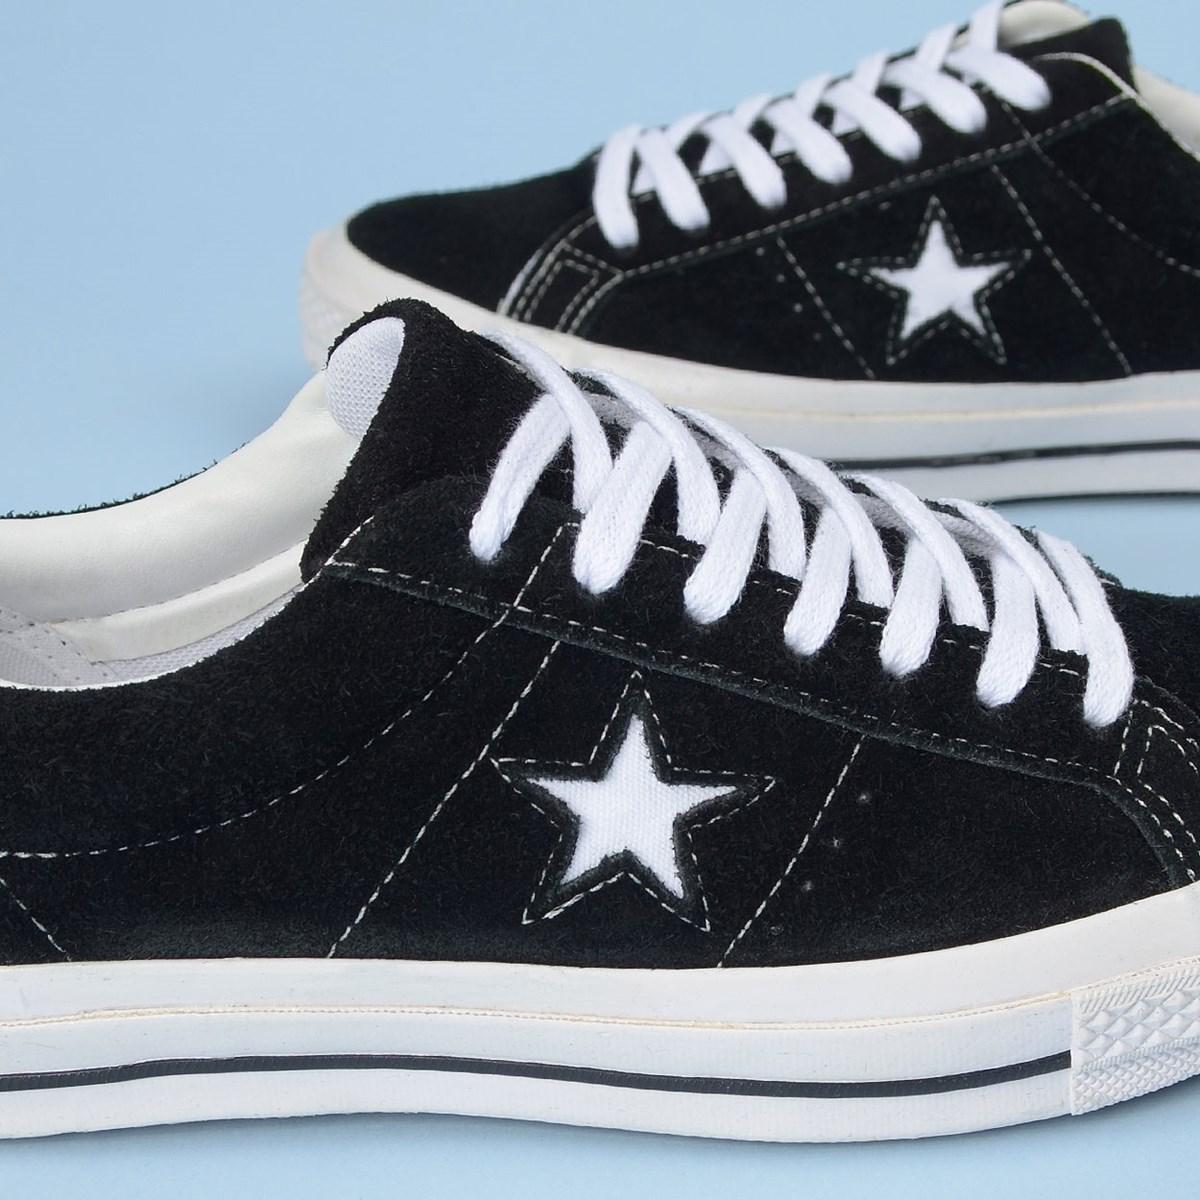 Tênis Converse One Star Preto Branco CO02600001